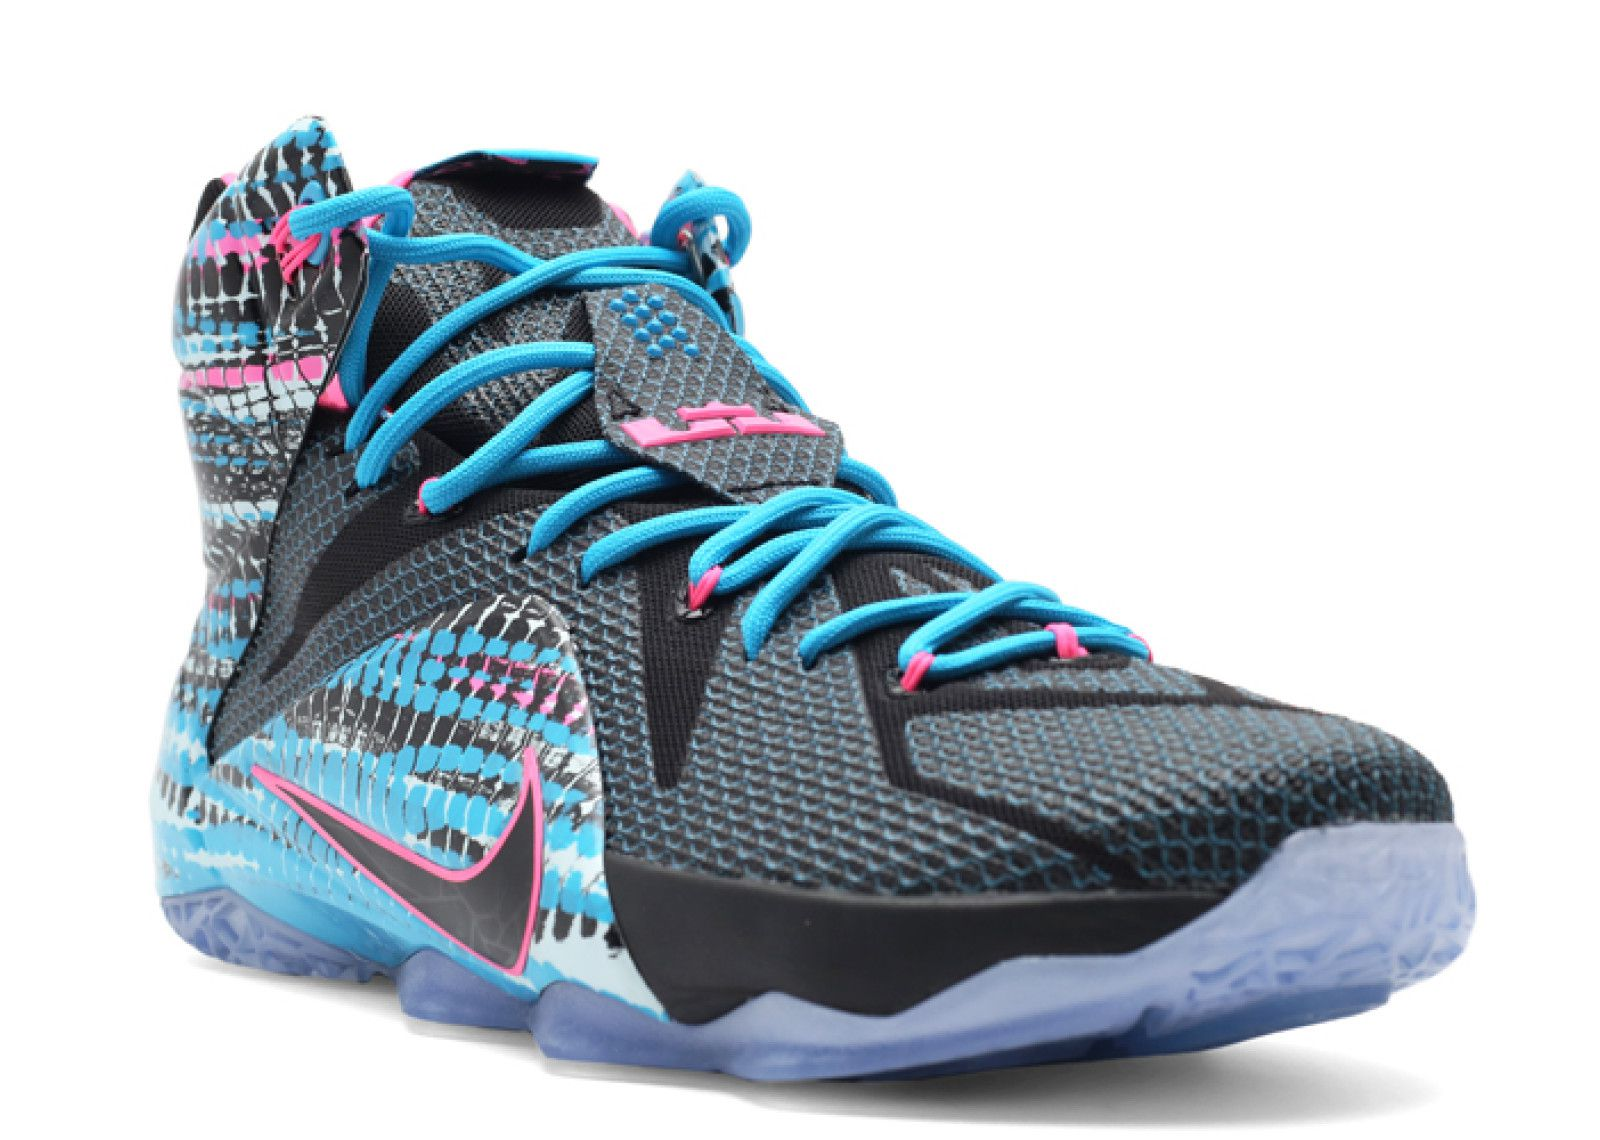 44156c041a4b Foot Locker Unlocked Nike LeBron 12  Nike 2018 Lebron X11 CHROMOSOMES Blue  Basketball Shoes . 150.00 Lebron 12 23 chromosomes  Colorway ...